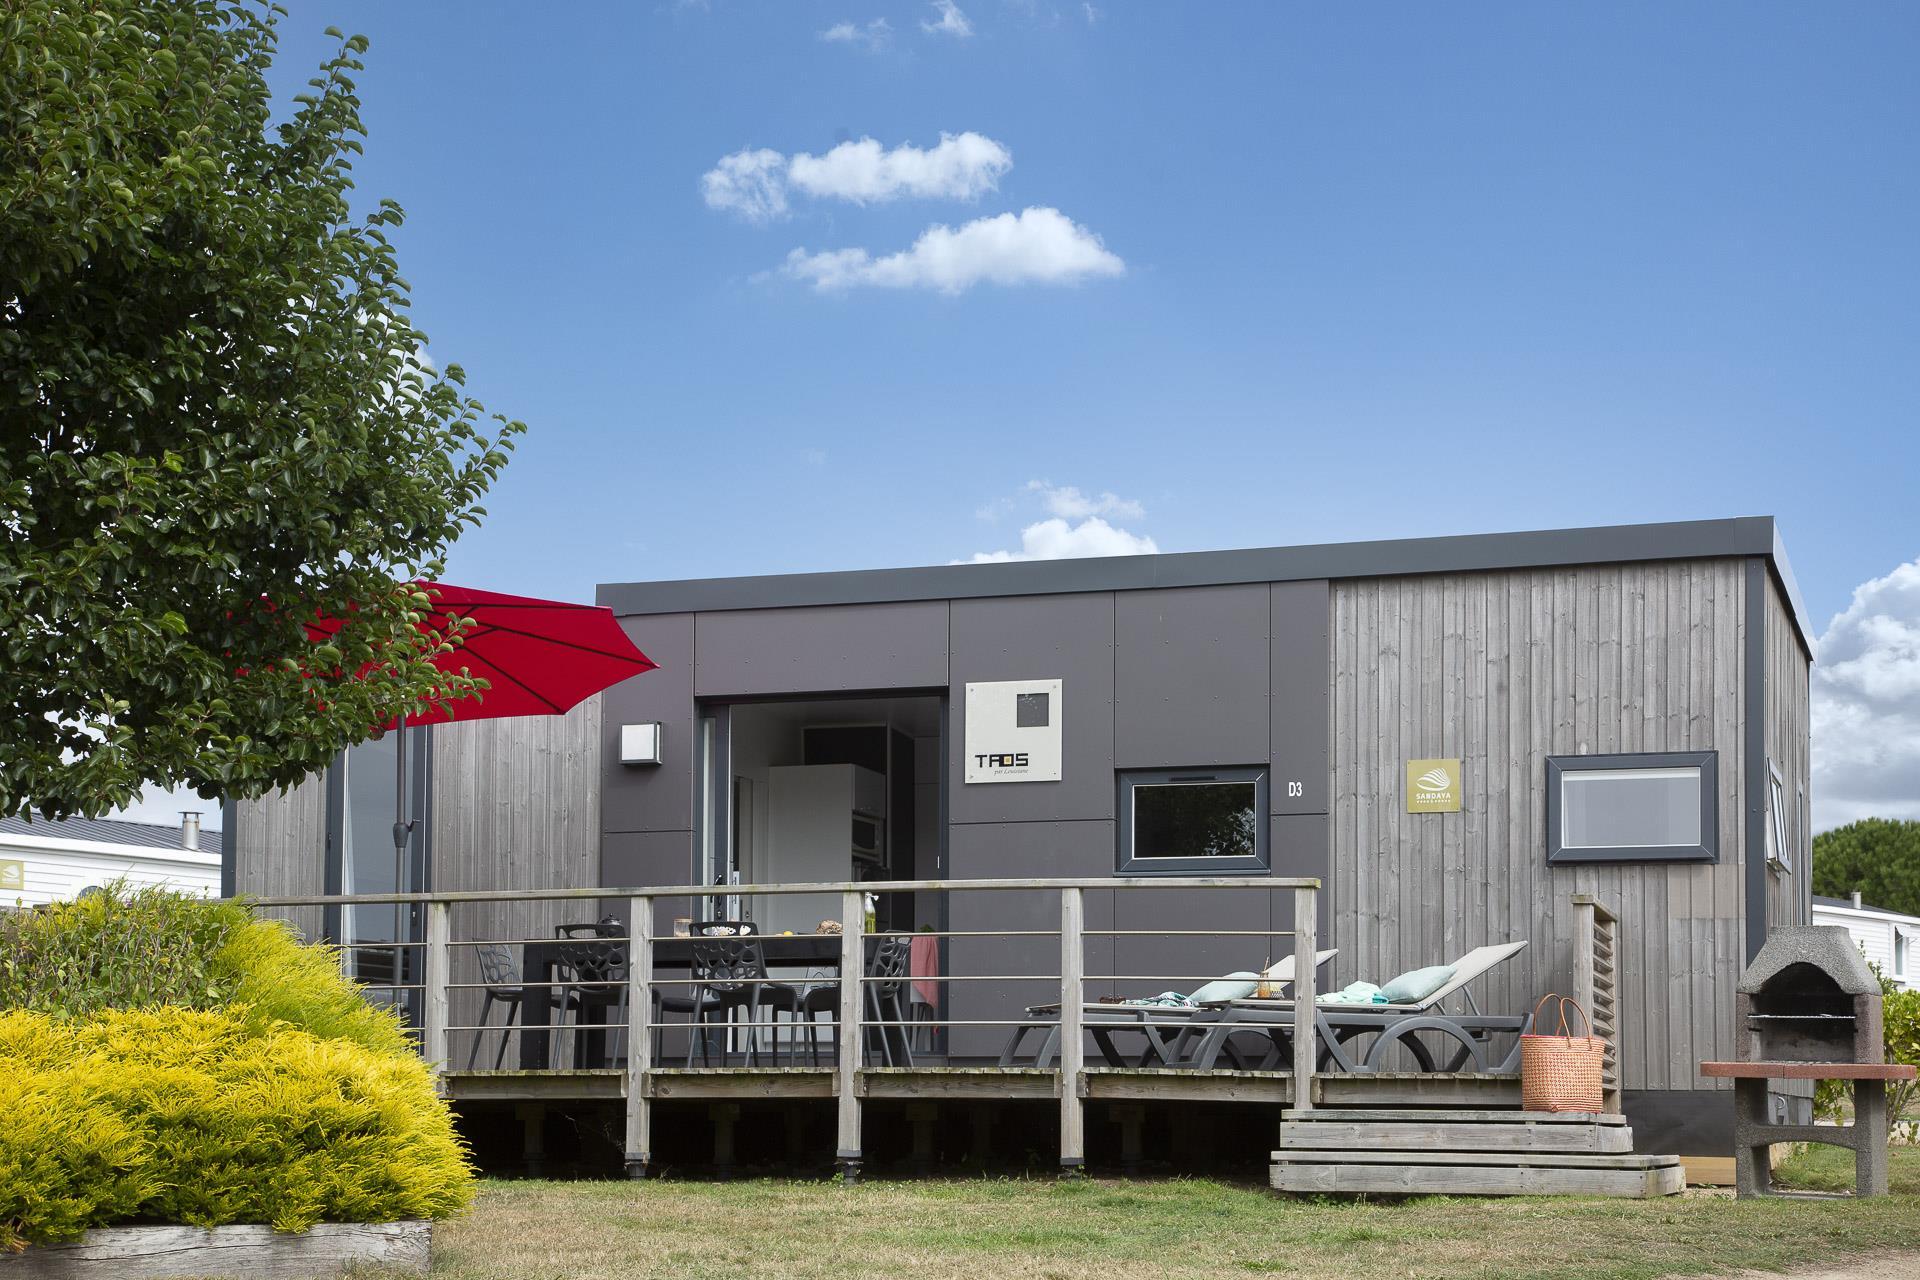 Location - Cottage Grand Large 3 Chambres Premium - Camping Sandaya Le Ranolien